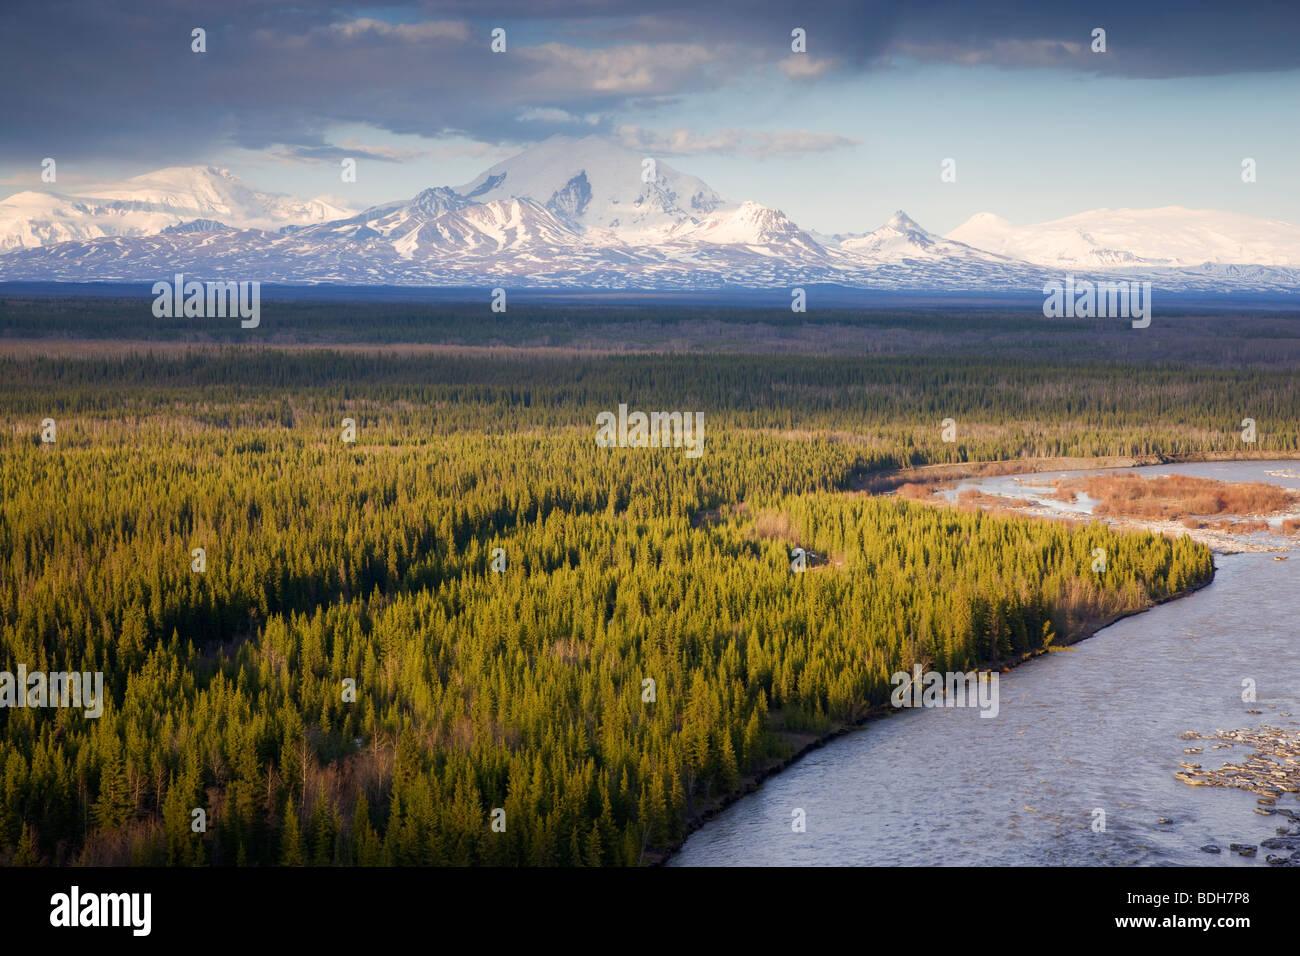 Mount Drum, Wrangell Saint Elias National Park, Alaska. - Stock Image